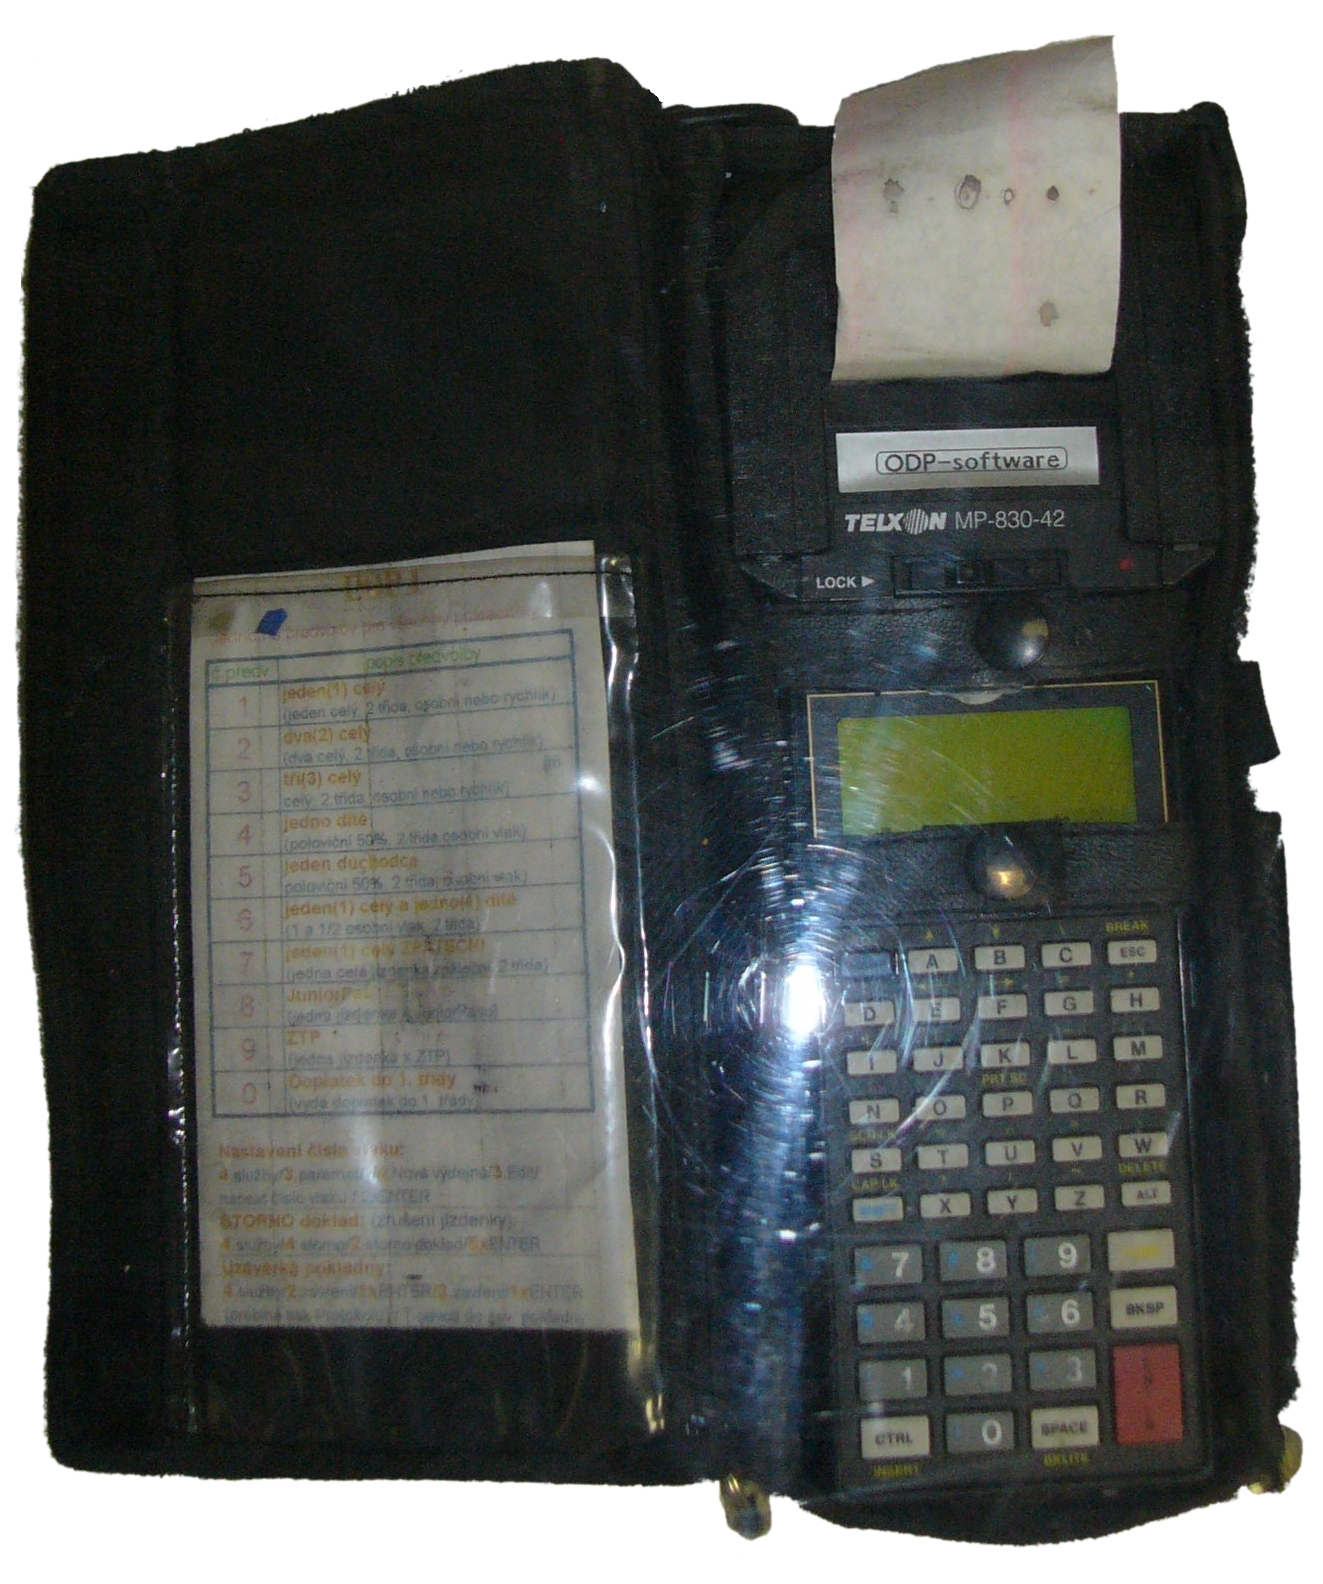 elxon-710isa16-bitmobilecomputer-710with830-42microrintercomputingprinter42-columnversion.